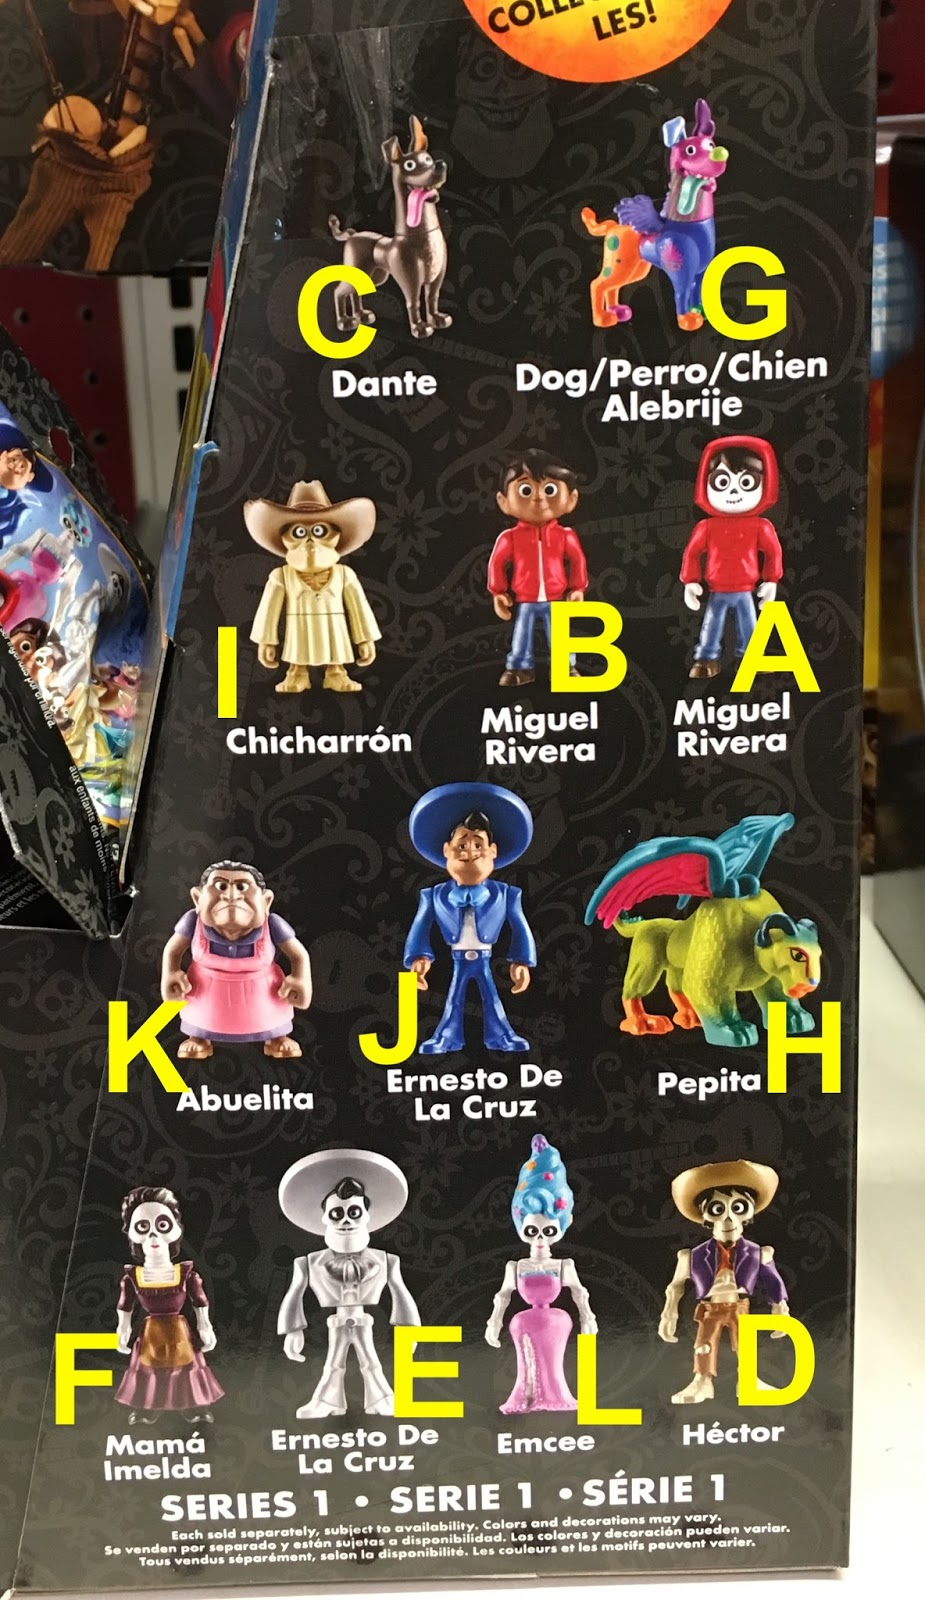 Mattel Disney pixar Coco Pepita 2017 Collectible Figurine